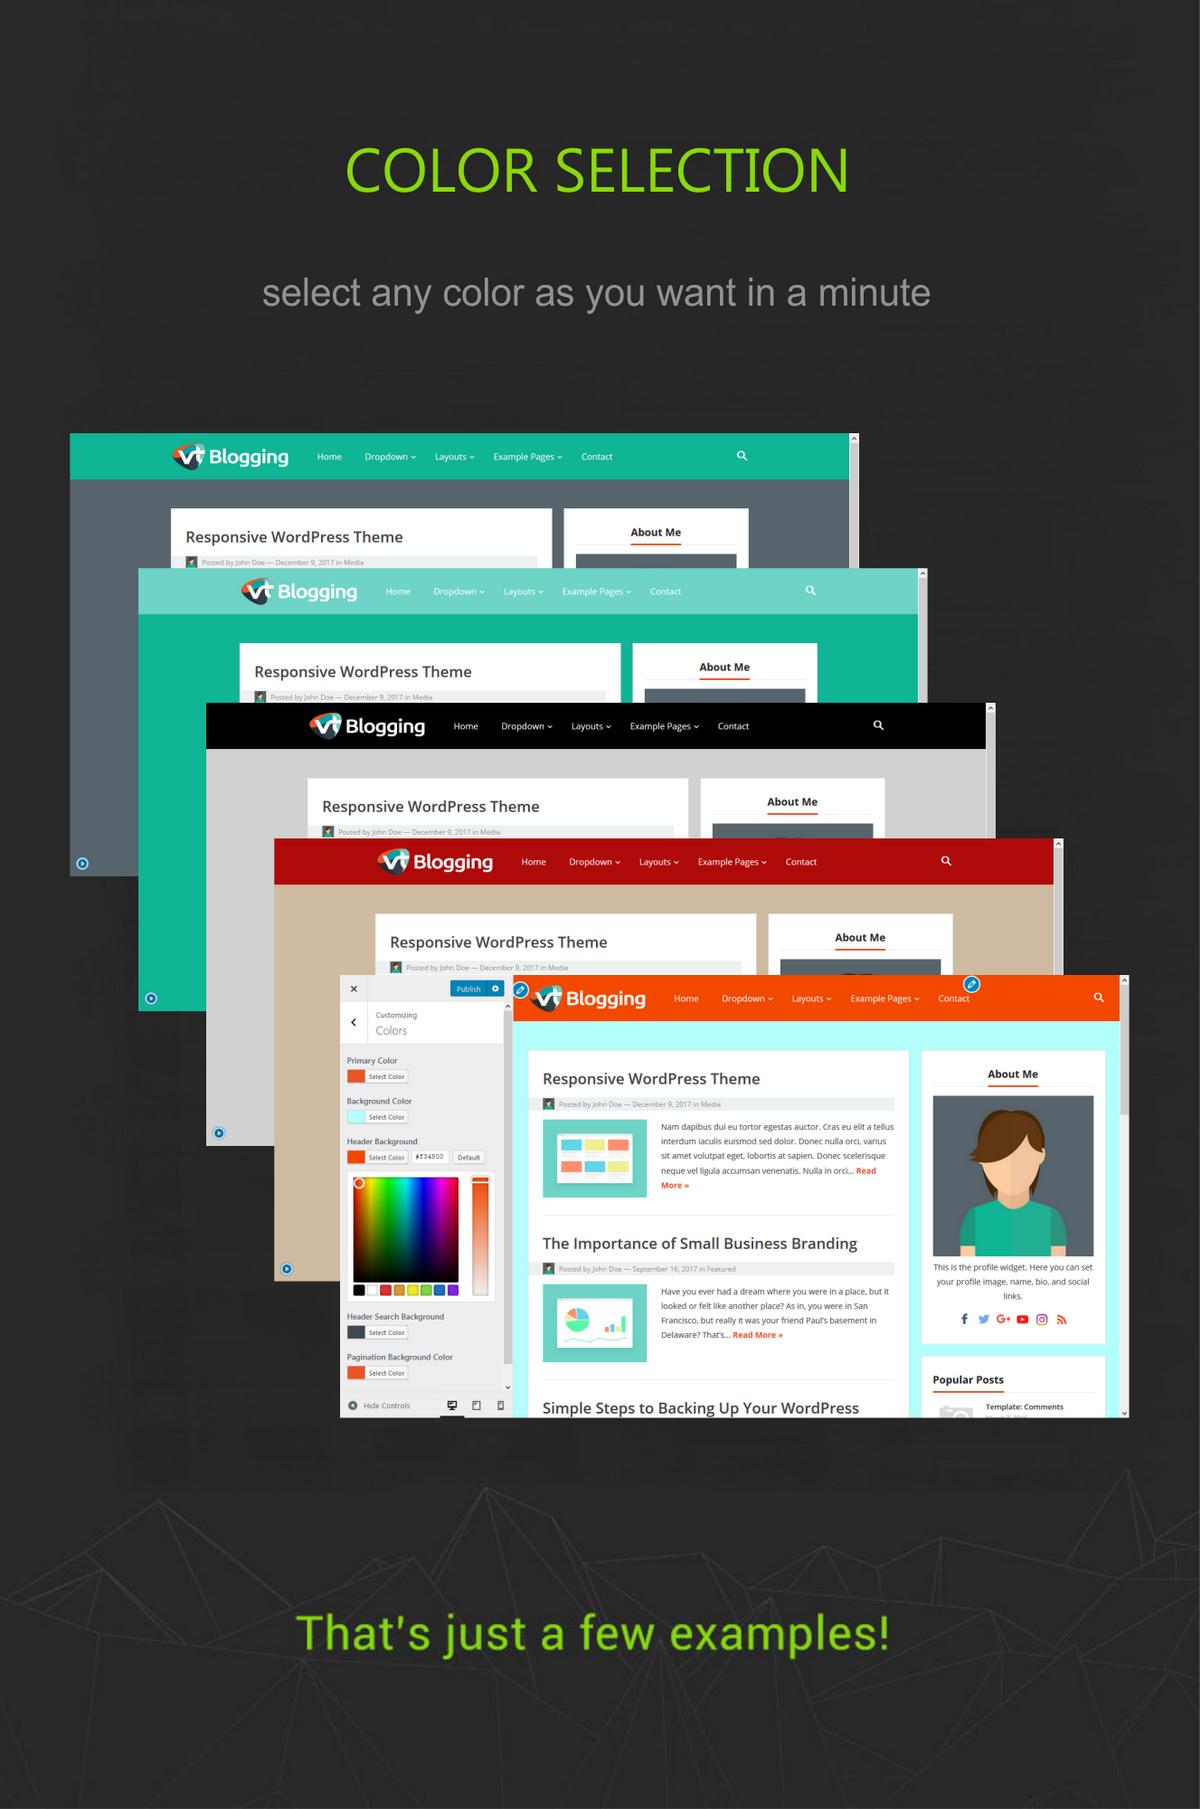 VT Blogging Color Selection